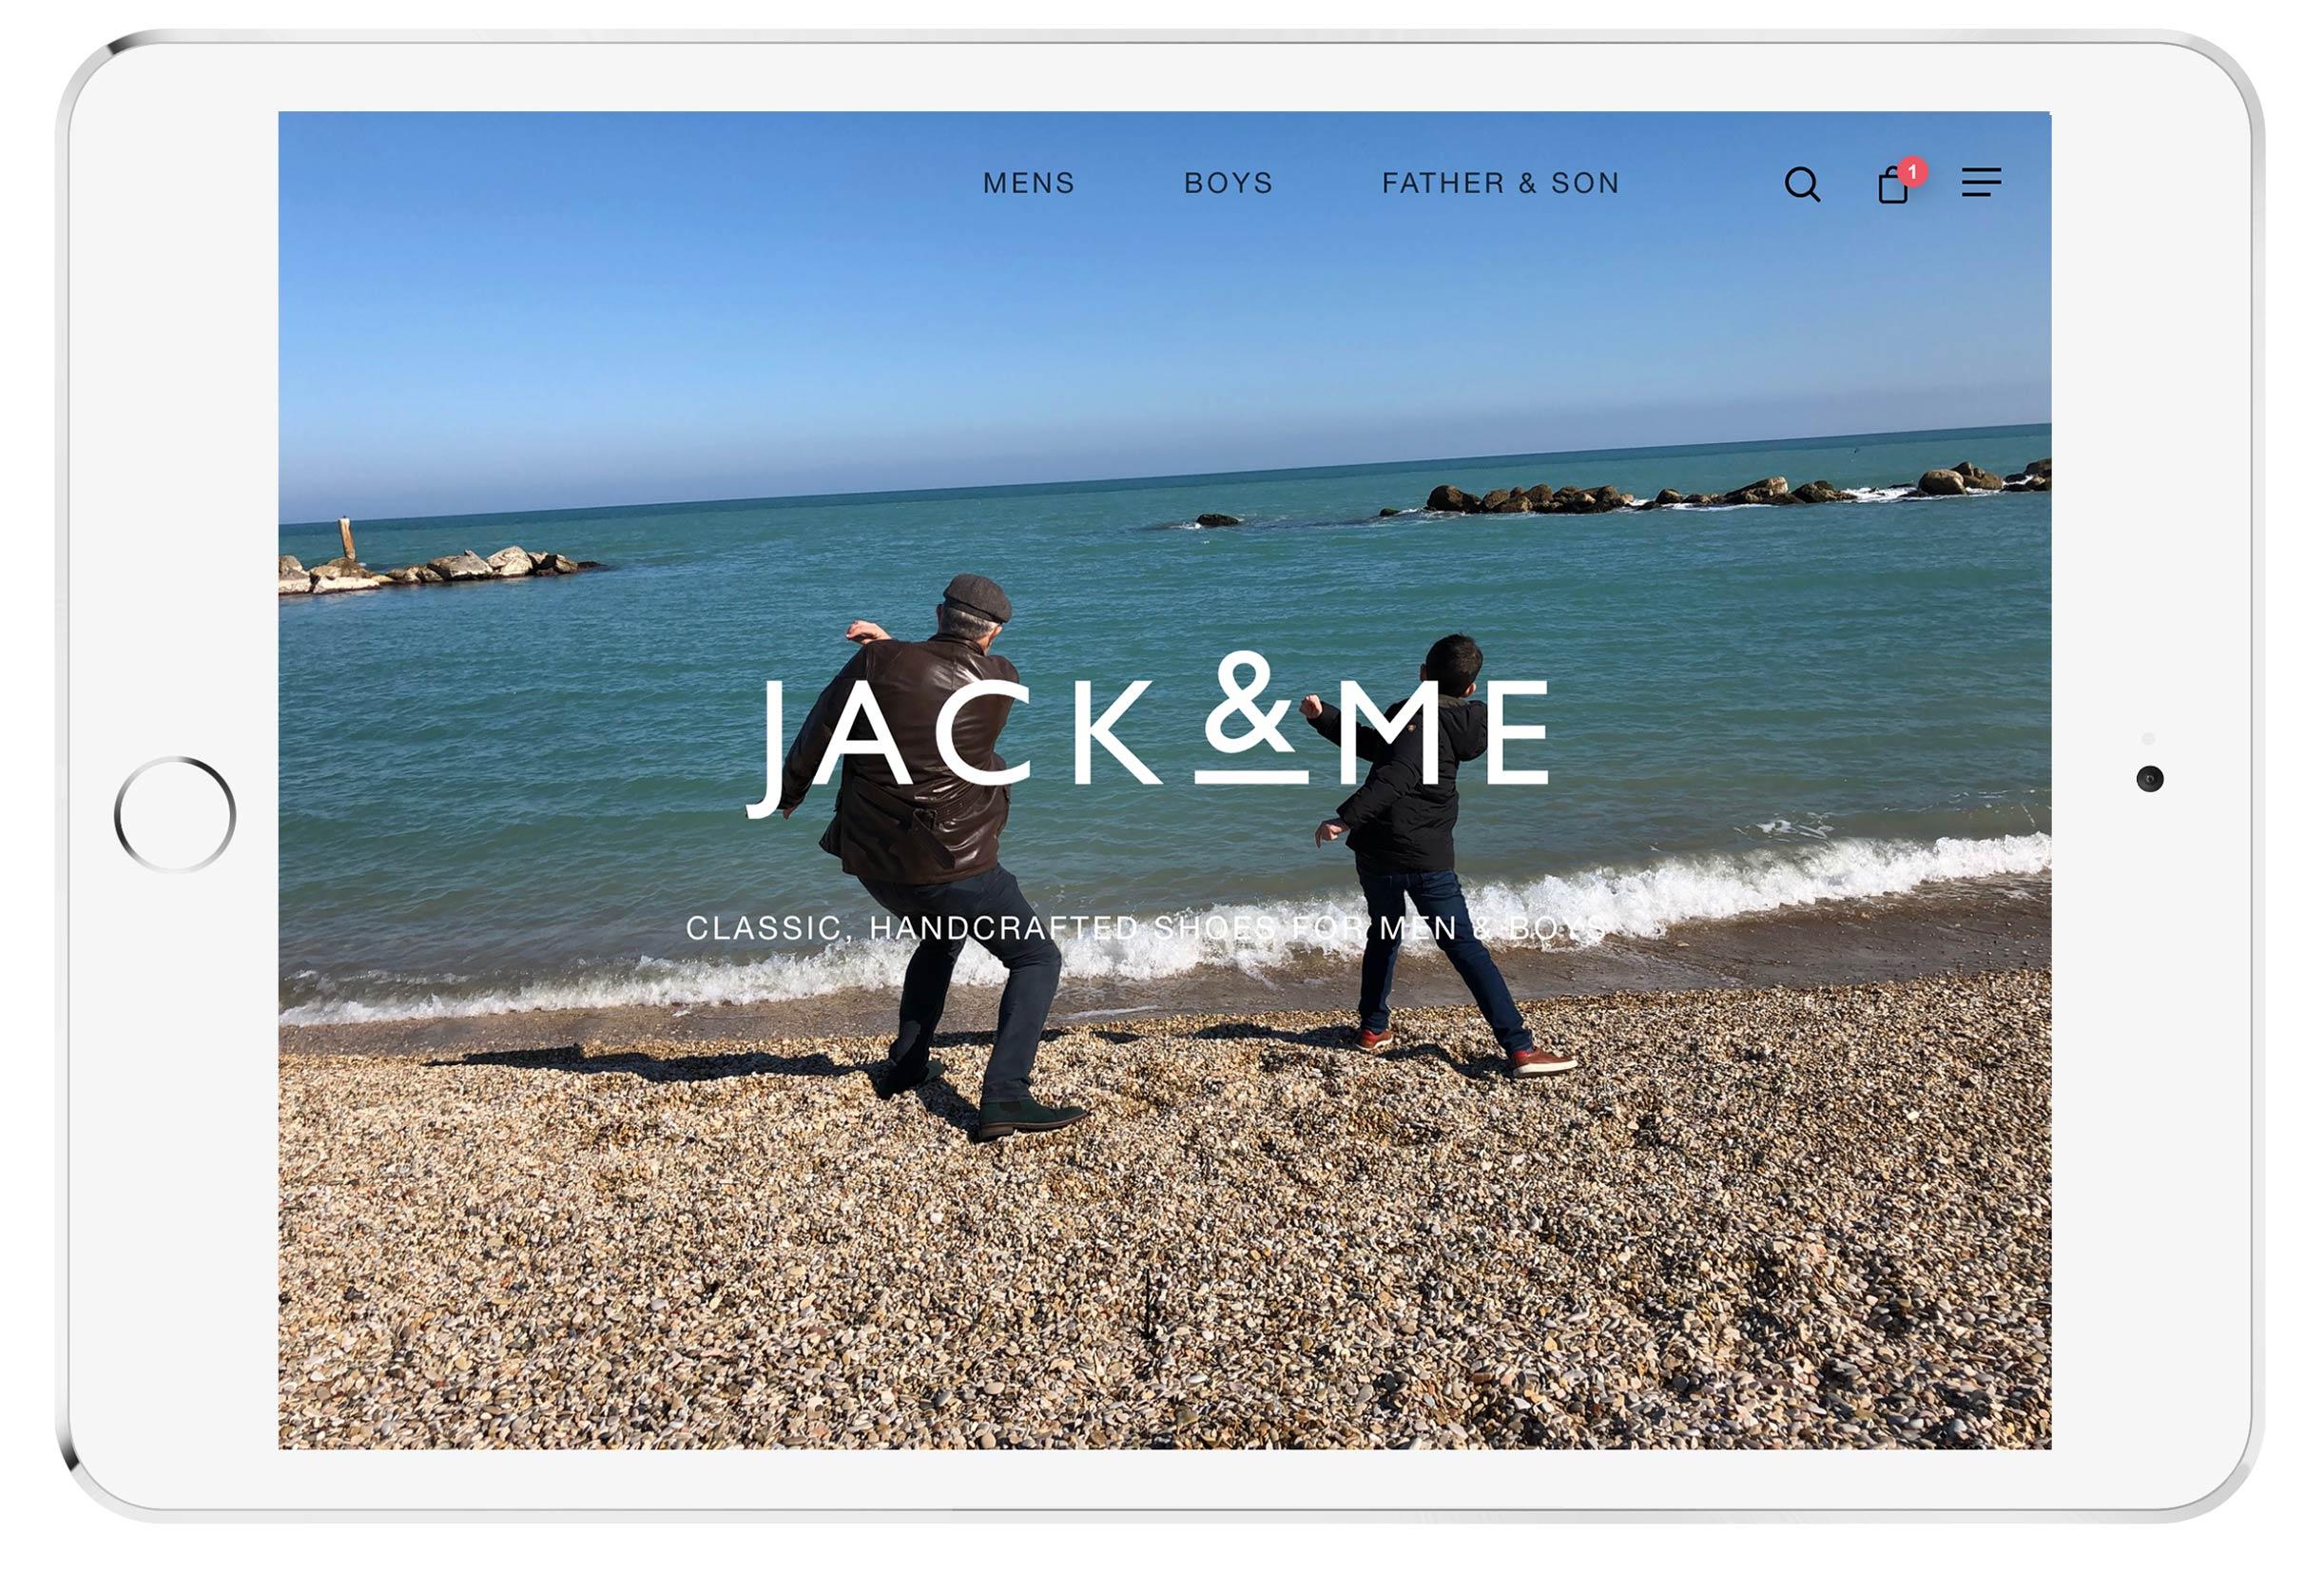 jack and me ecommerce website mockup